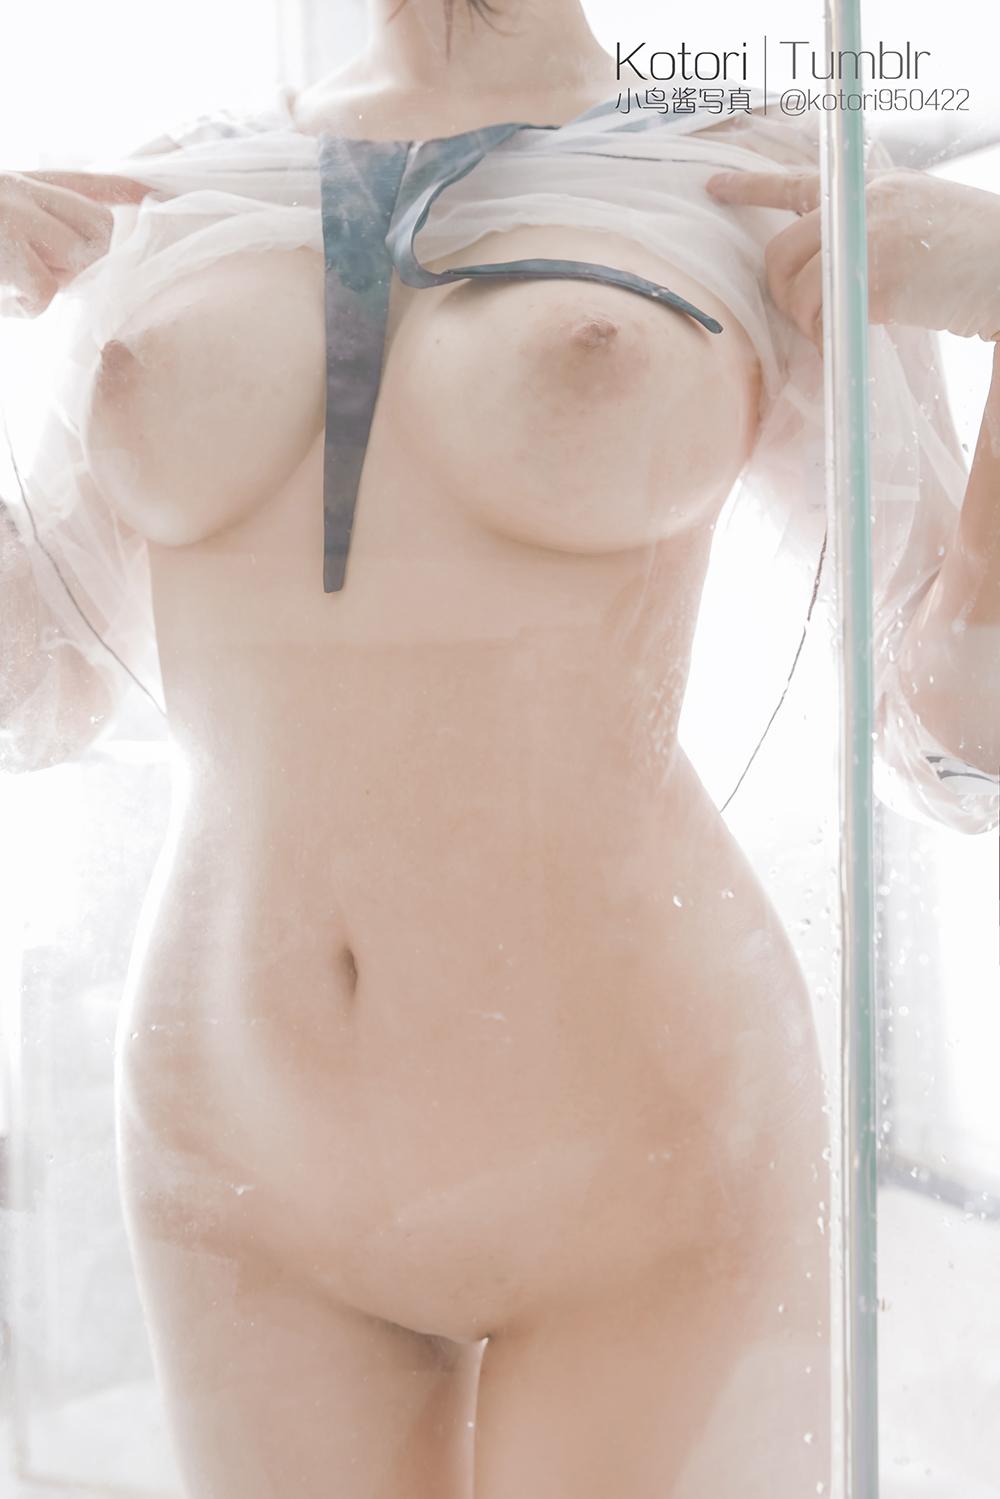 D9H1RI - Cosplay girl Tumblr PR社 福利姬 小鸟酱 透明薄纱装